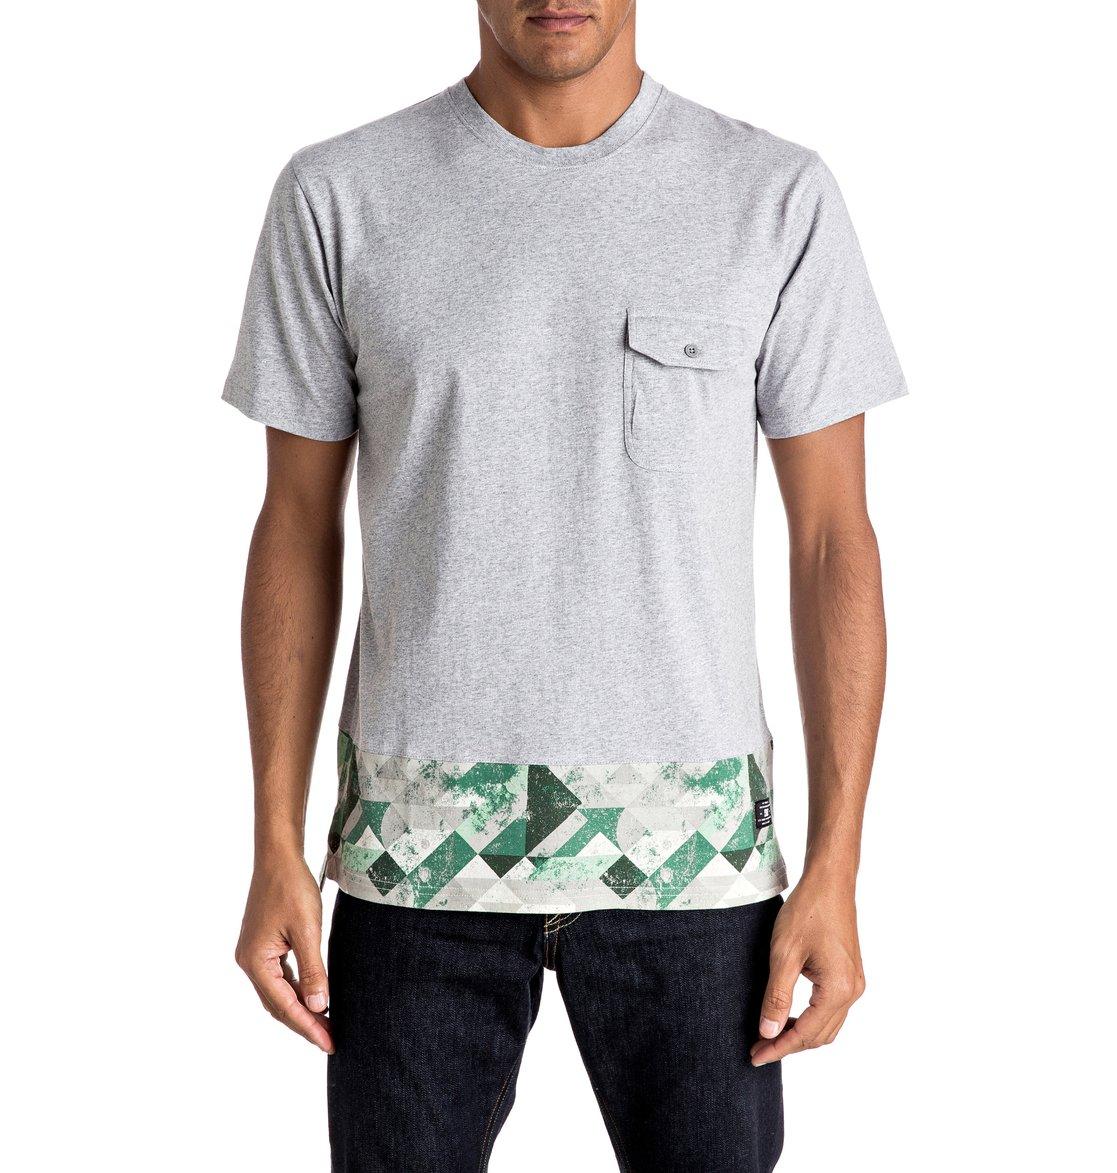 DC-Shoes-Owensboro-Camiseta-para-Hombre-EDYKT03337